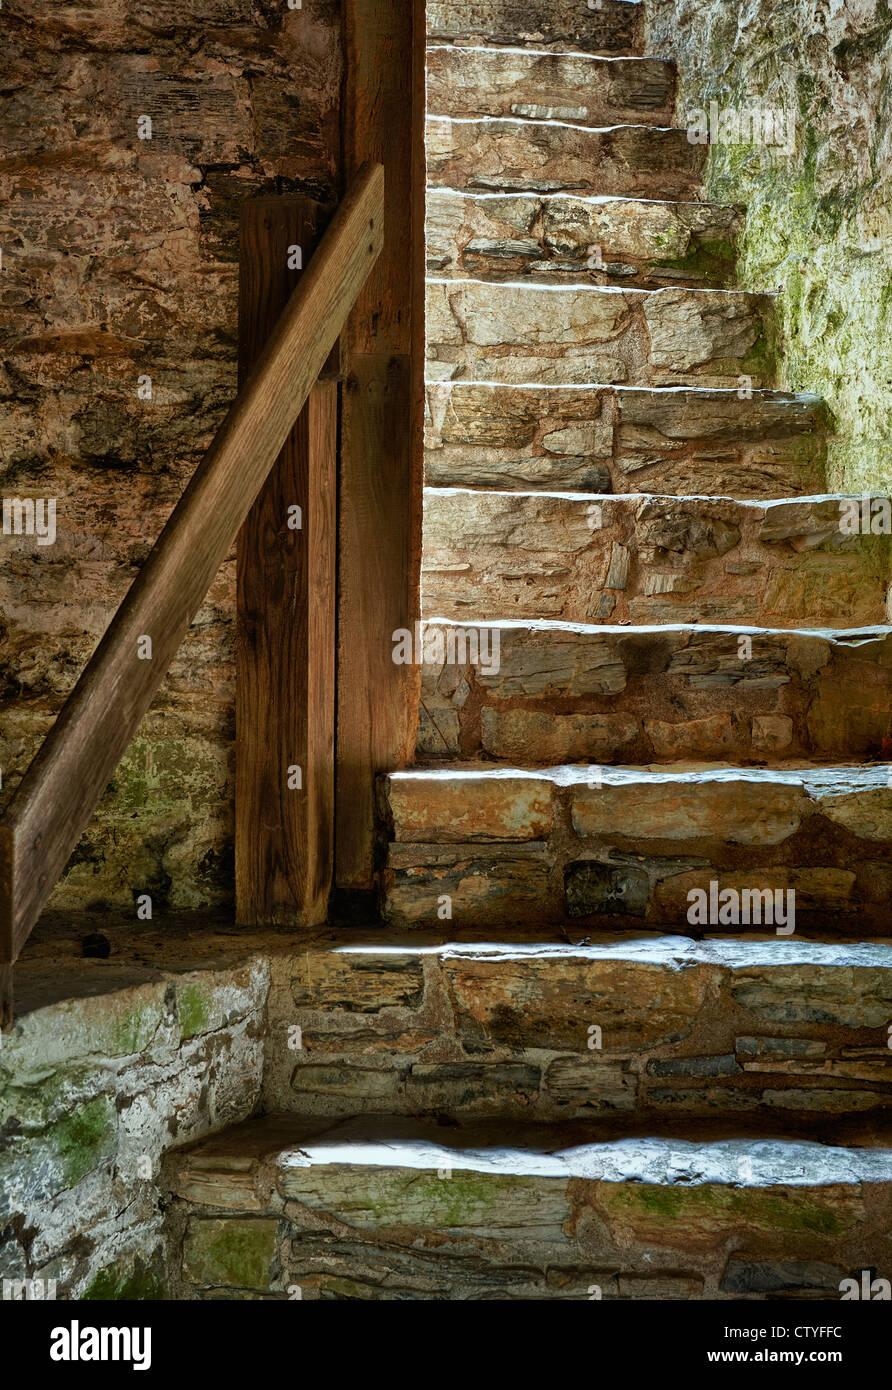 Escaliers de pierre. Photo Stock